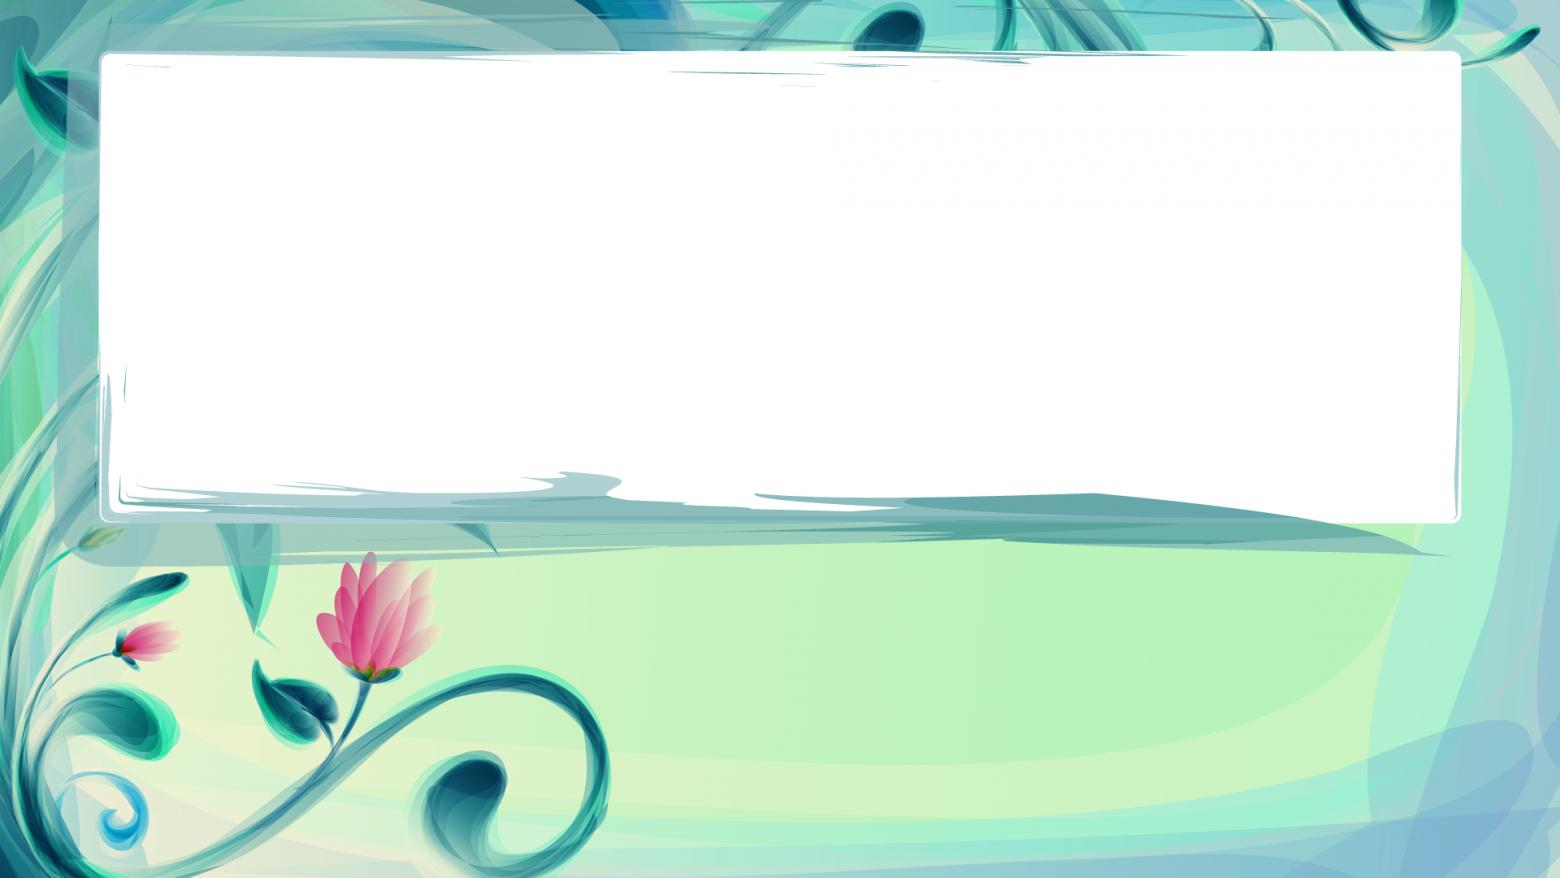 whiteout-background-928804